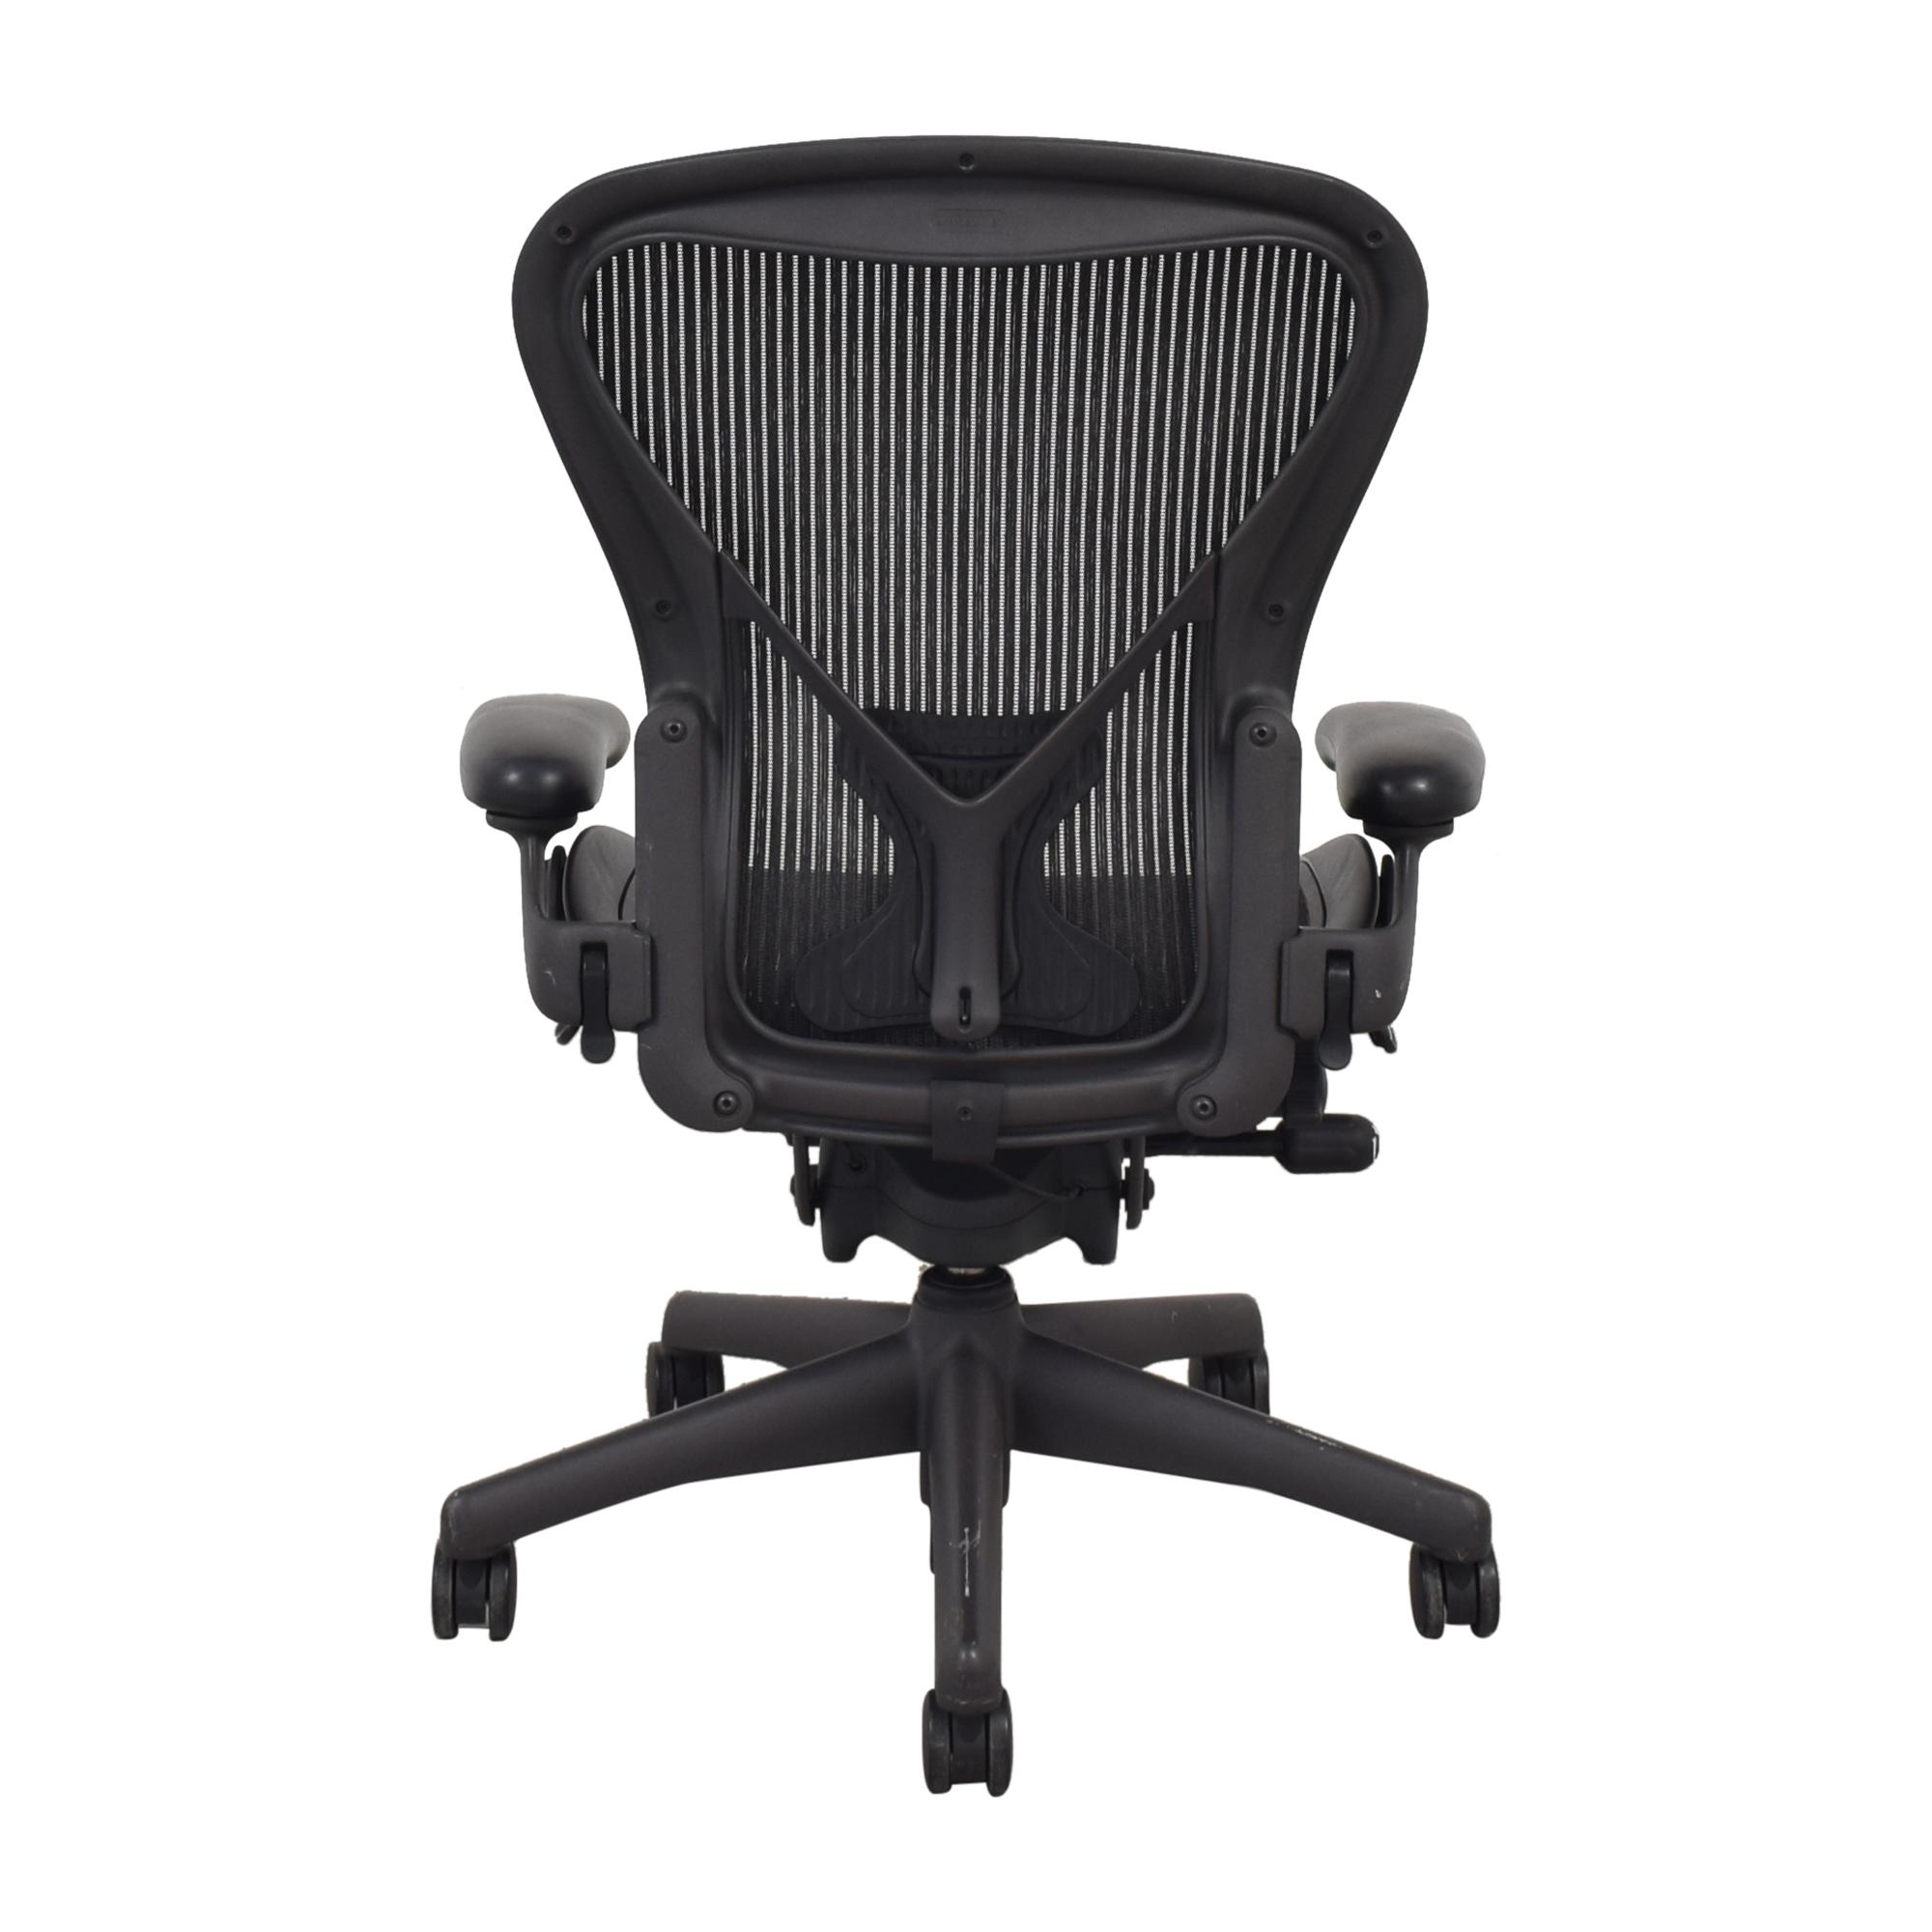 Herman Miller Herman Miller Aeron Office Chair discount